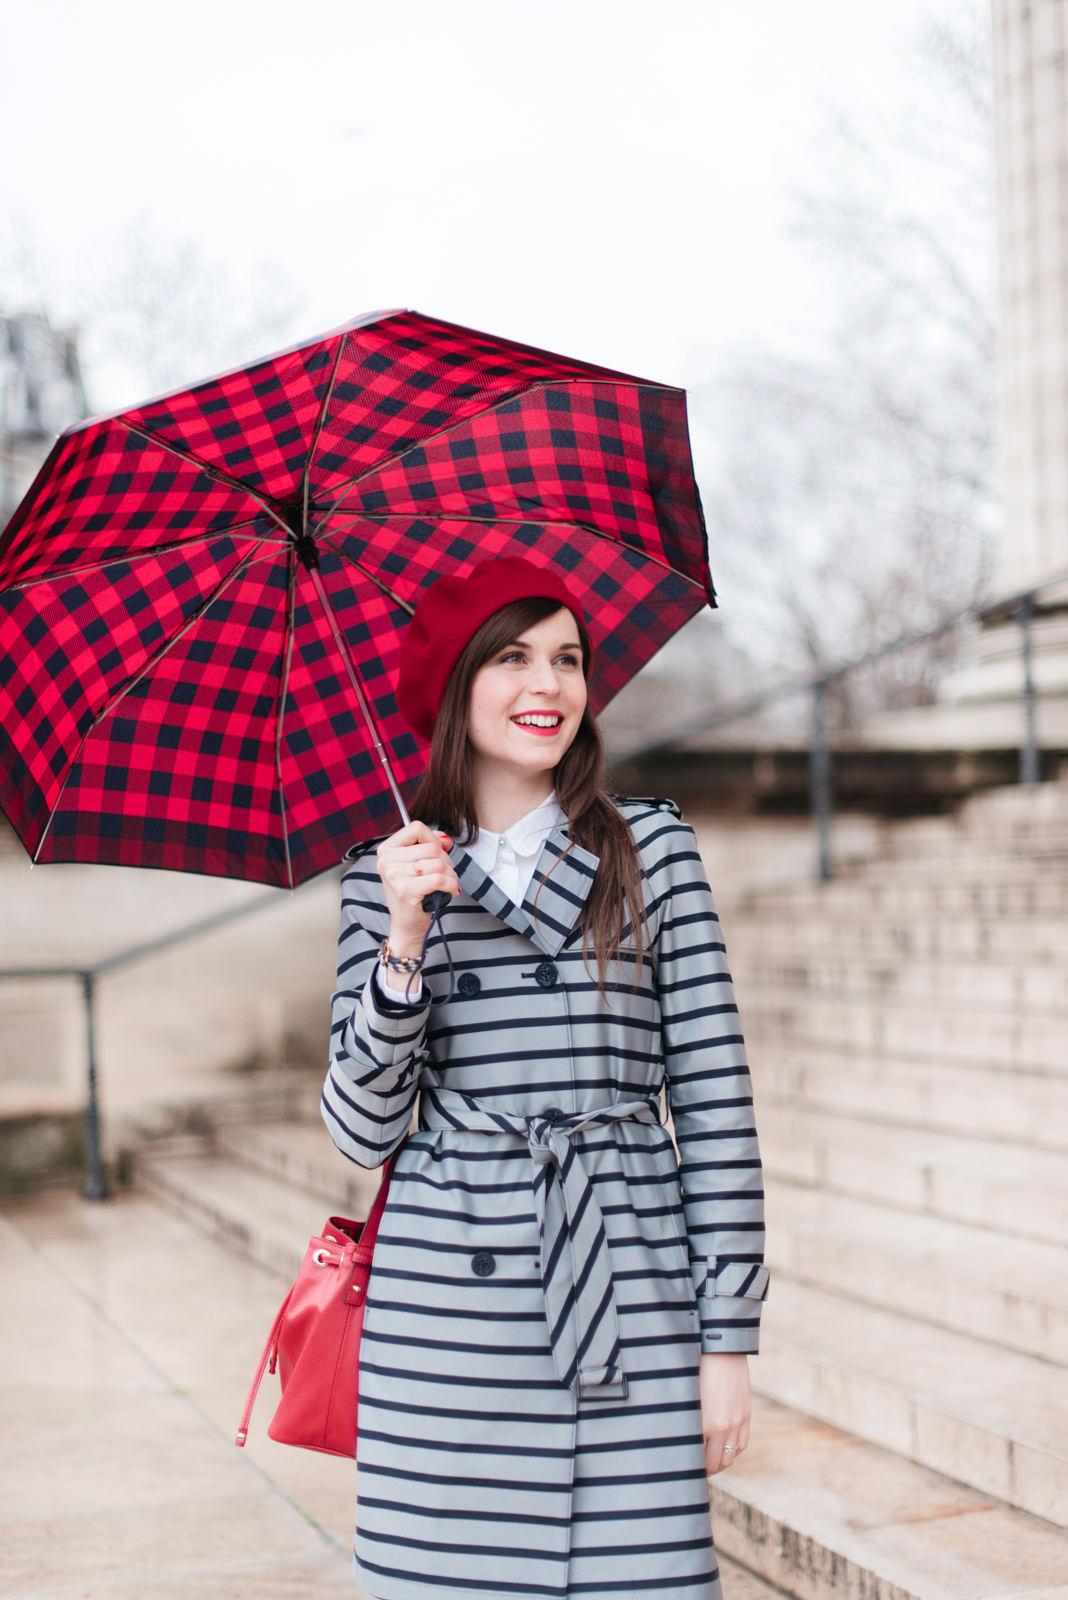 Blog-Mode-And-The-City-Looks-Comment-S-Habiller-quand-il-pleut-6